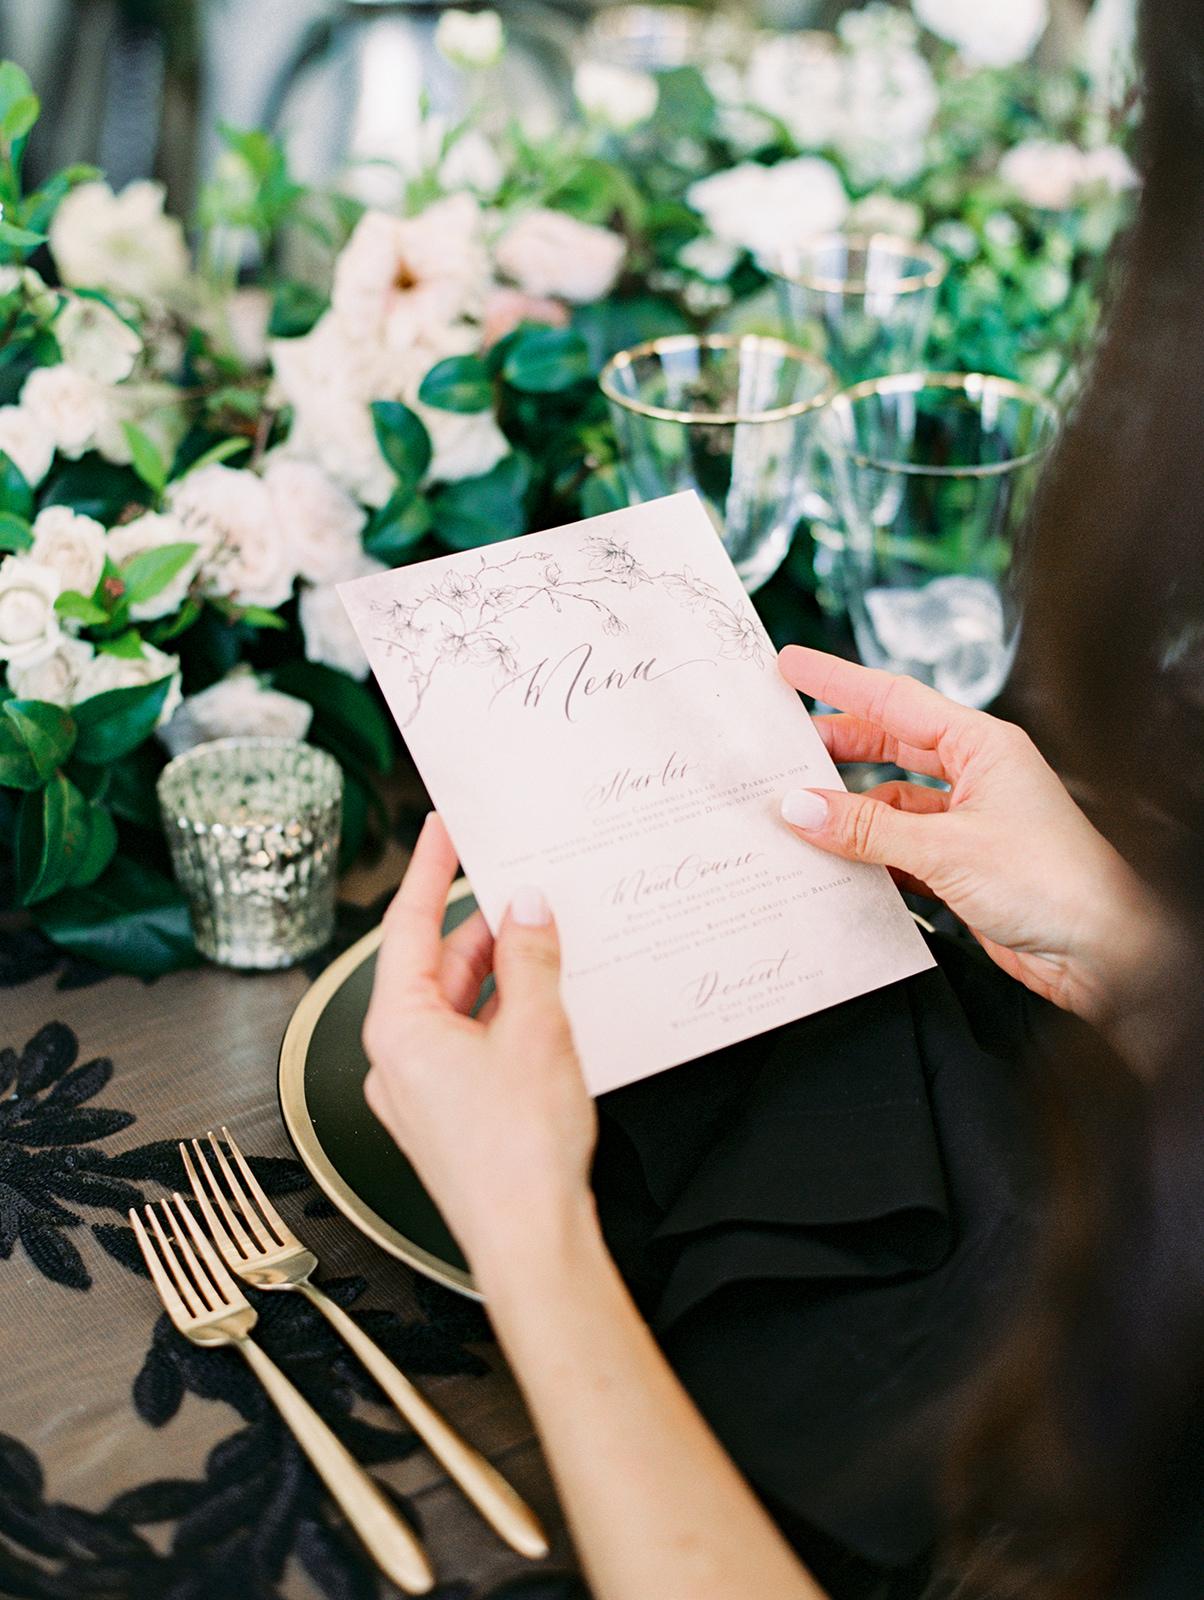 Photo by  Jon Cu Photography    Wedding Planning by  The Elegant Ninja    Floral by  Poppy Design Co    Venue  Malibu Rocky Oaks    Rental  Premiere Party Rents    Linen by  La Tavola Linen    Stationery by  Seniman Calligraphy